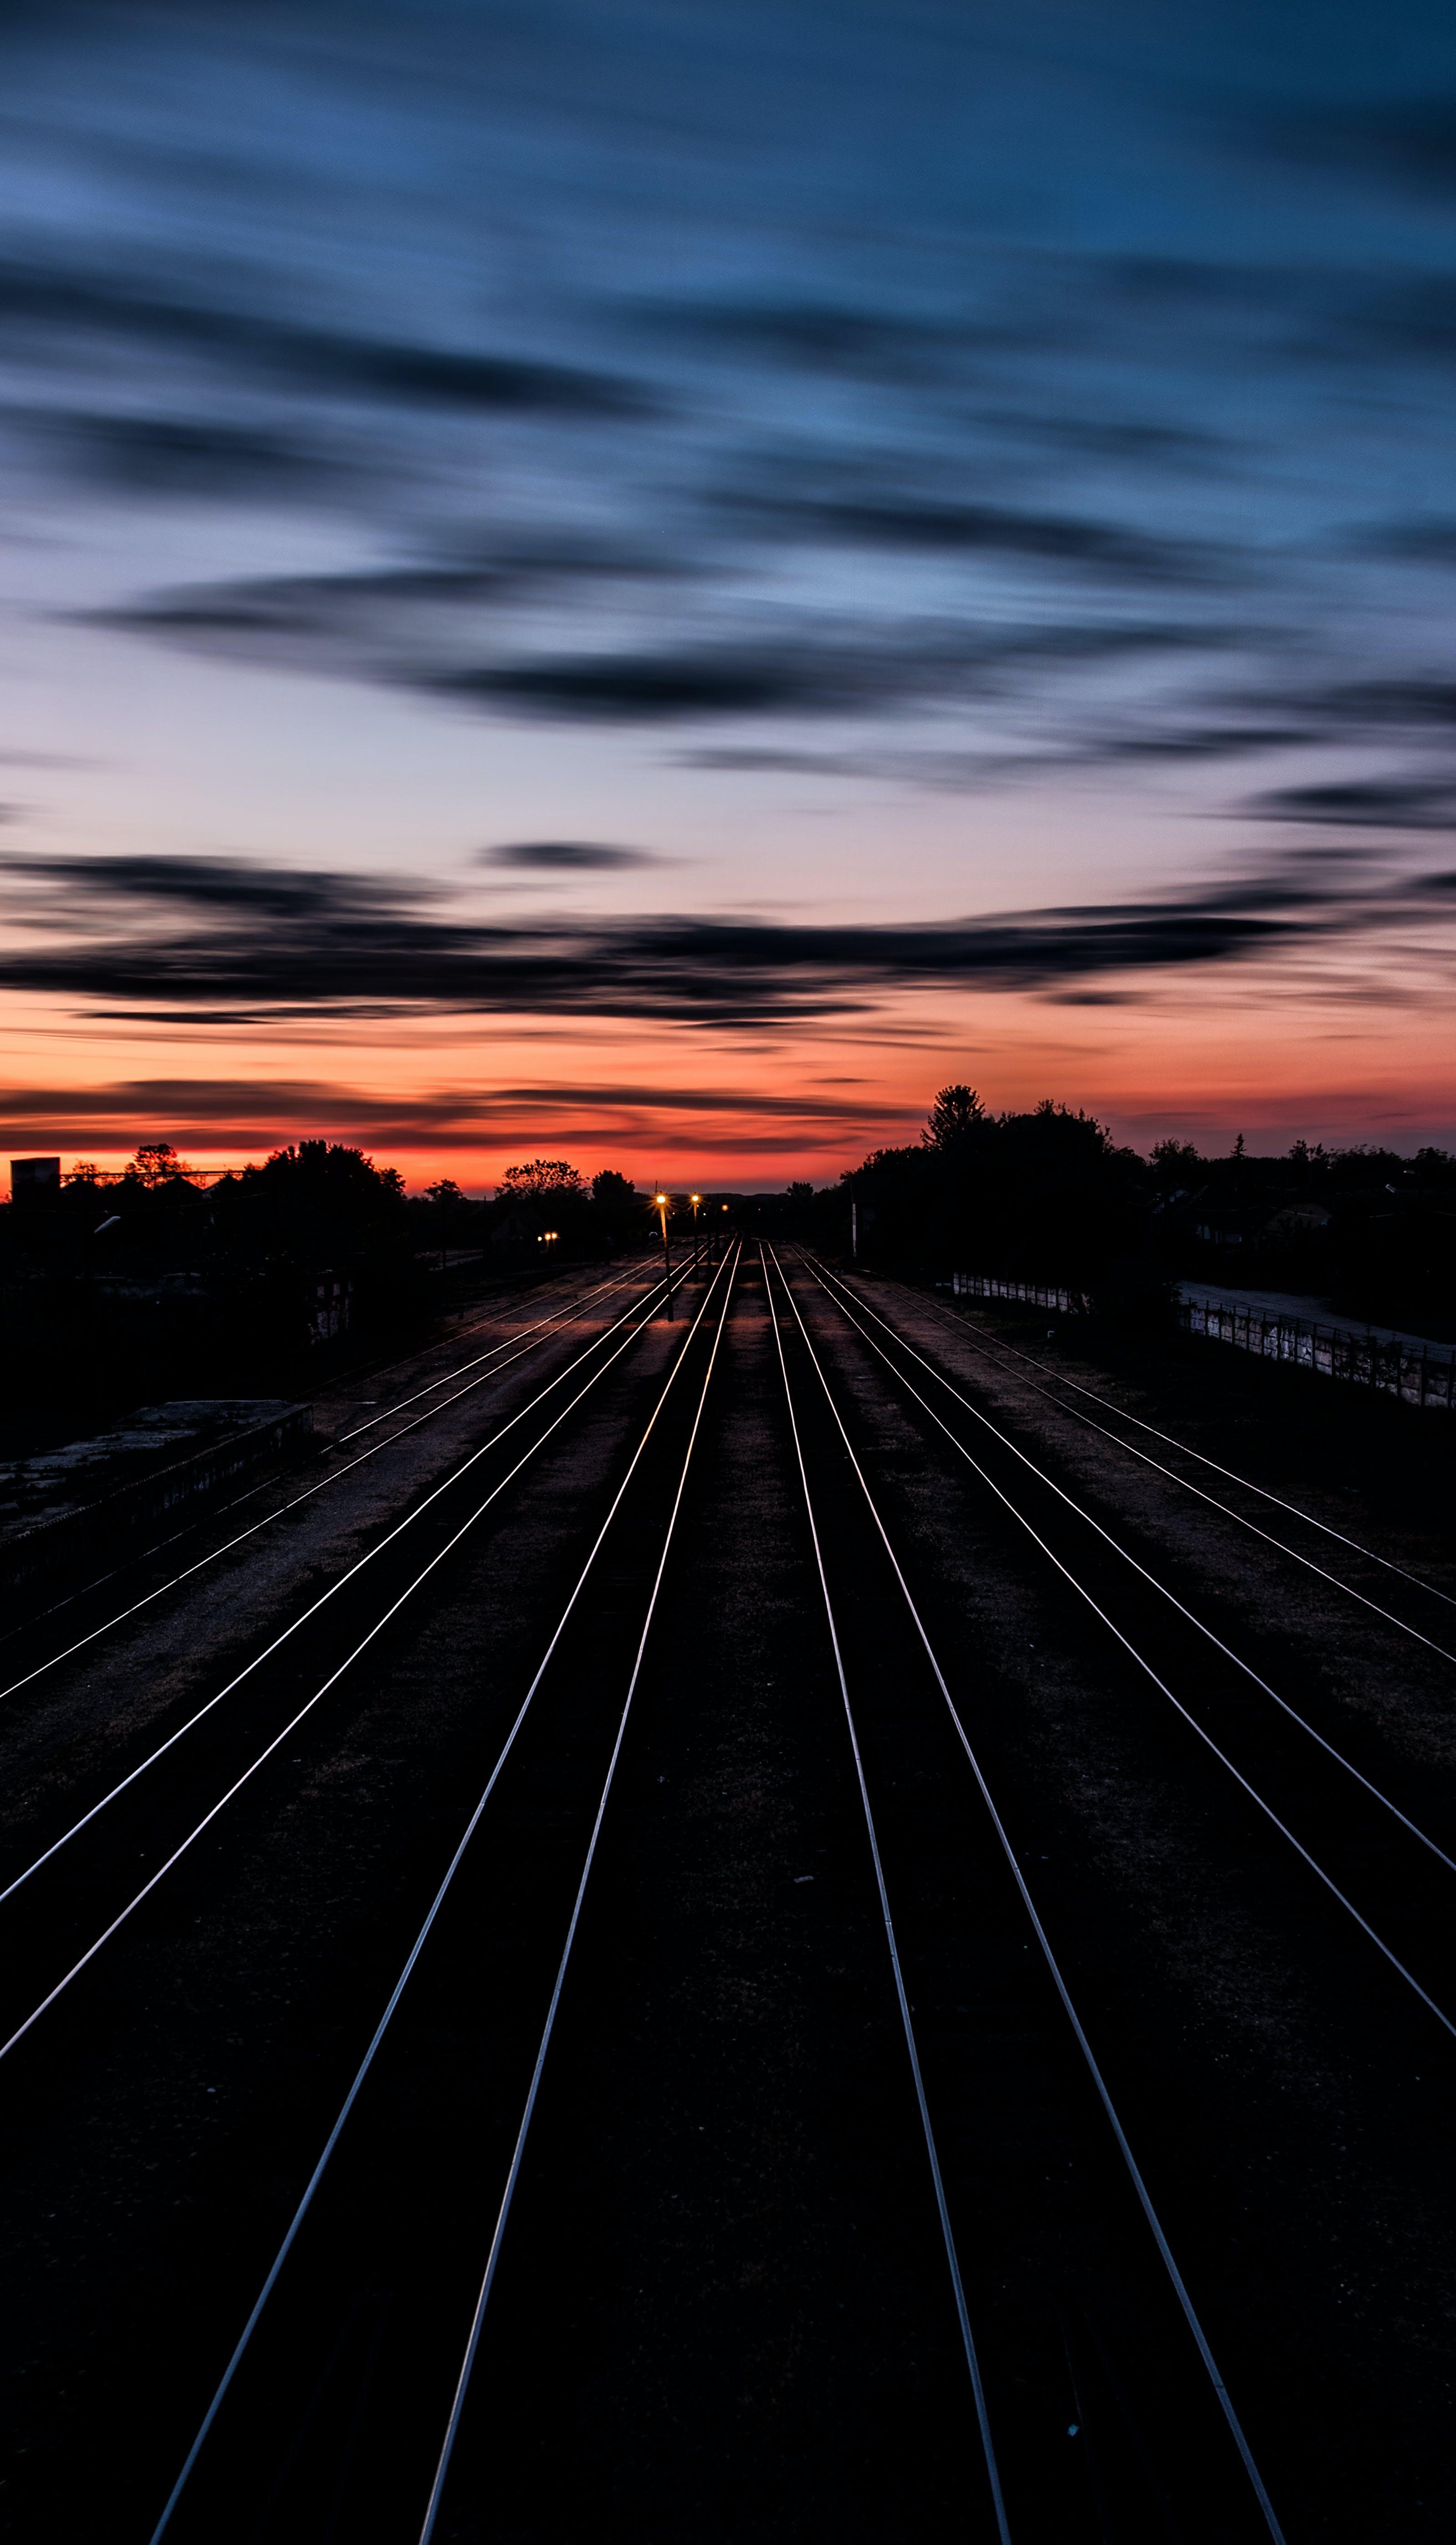 Stainless Steel Train Rails